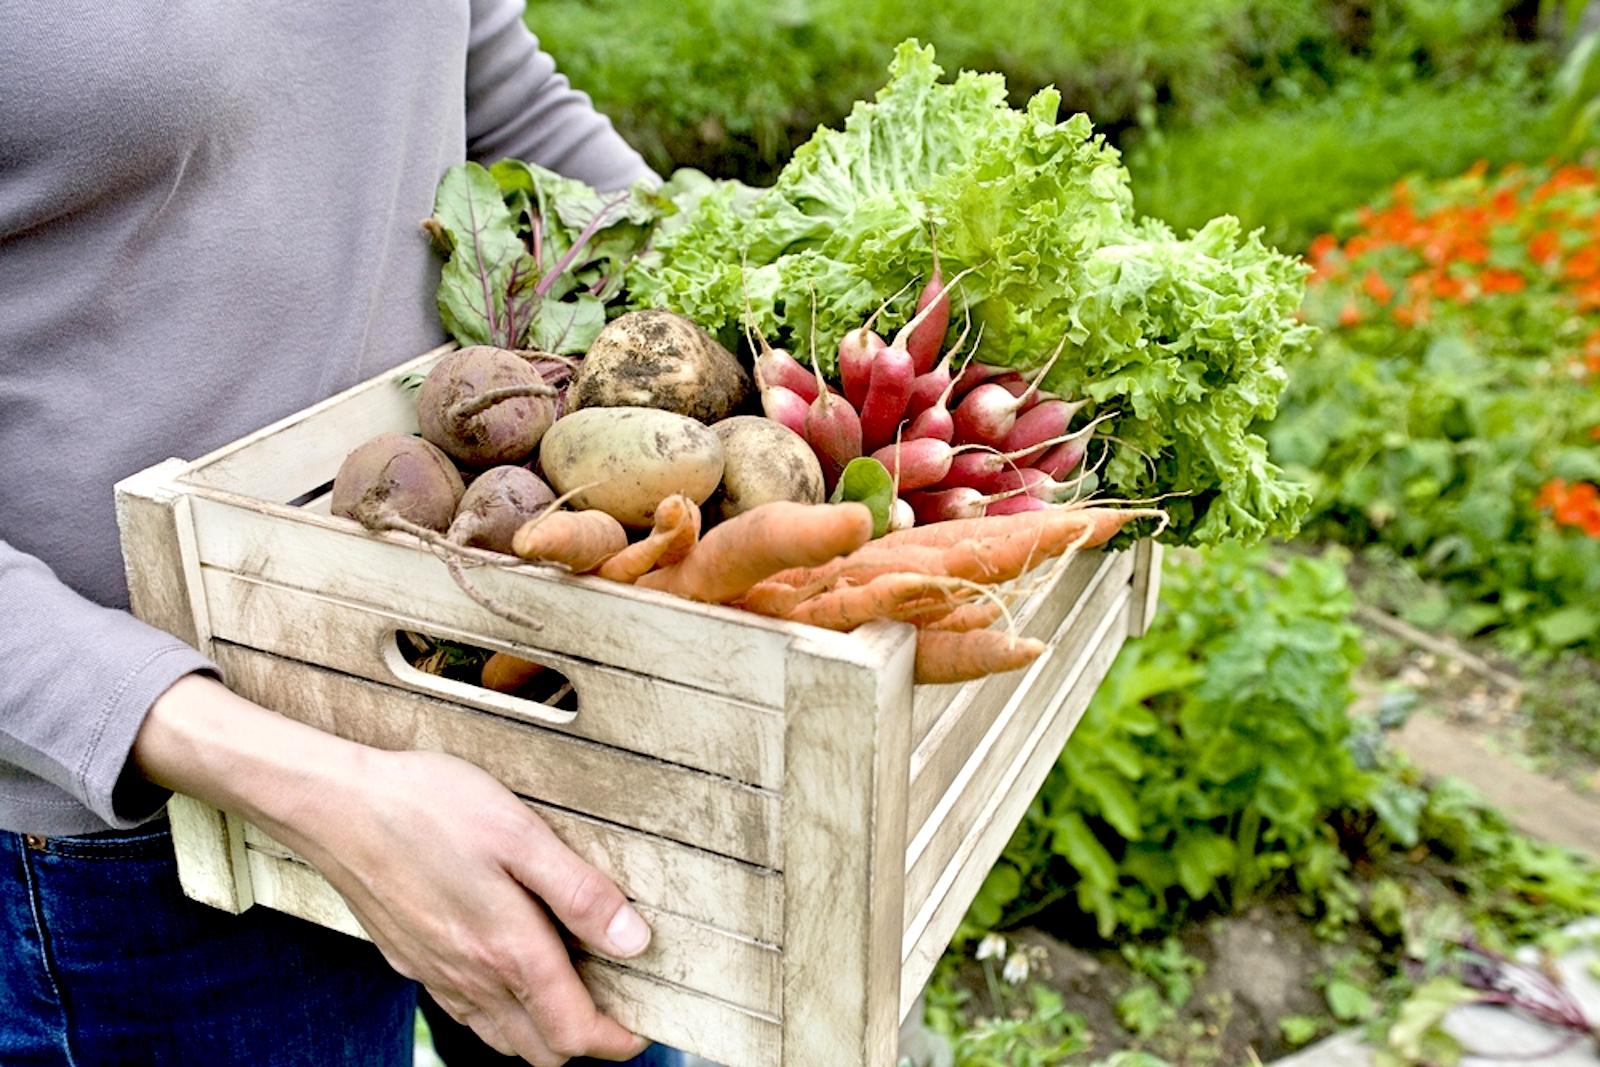 vegetables for your spring garden